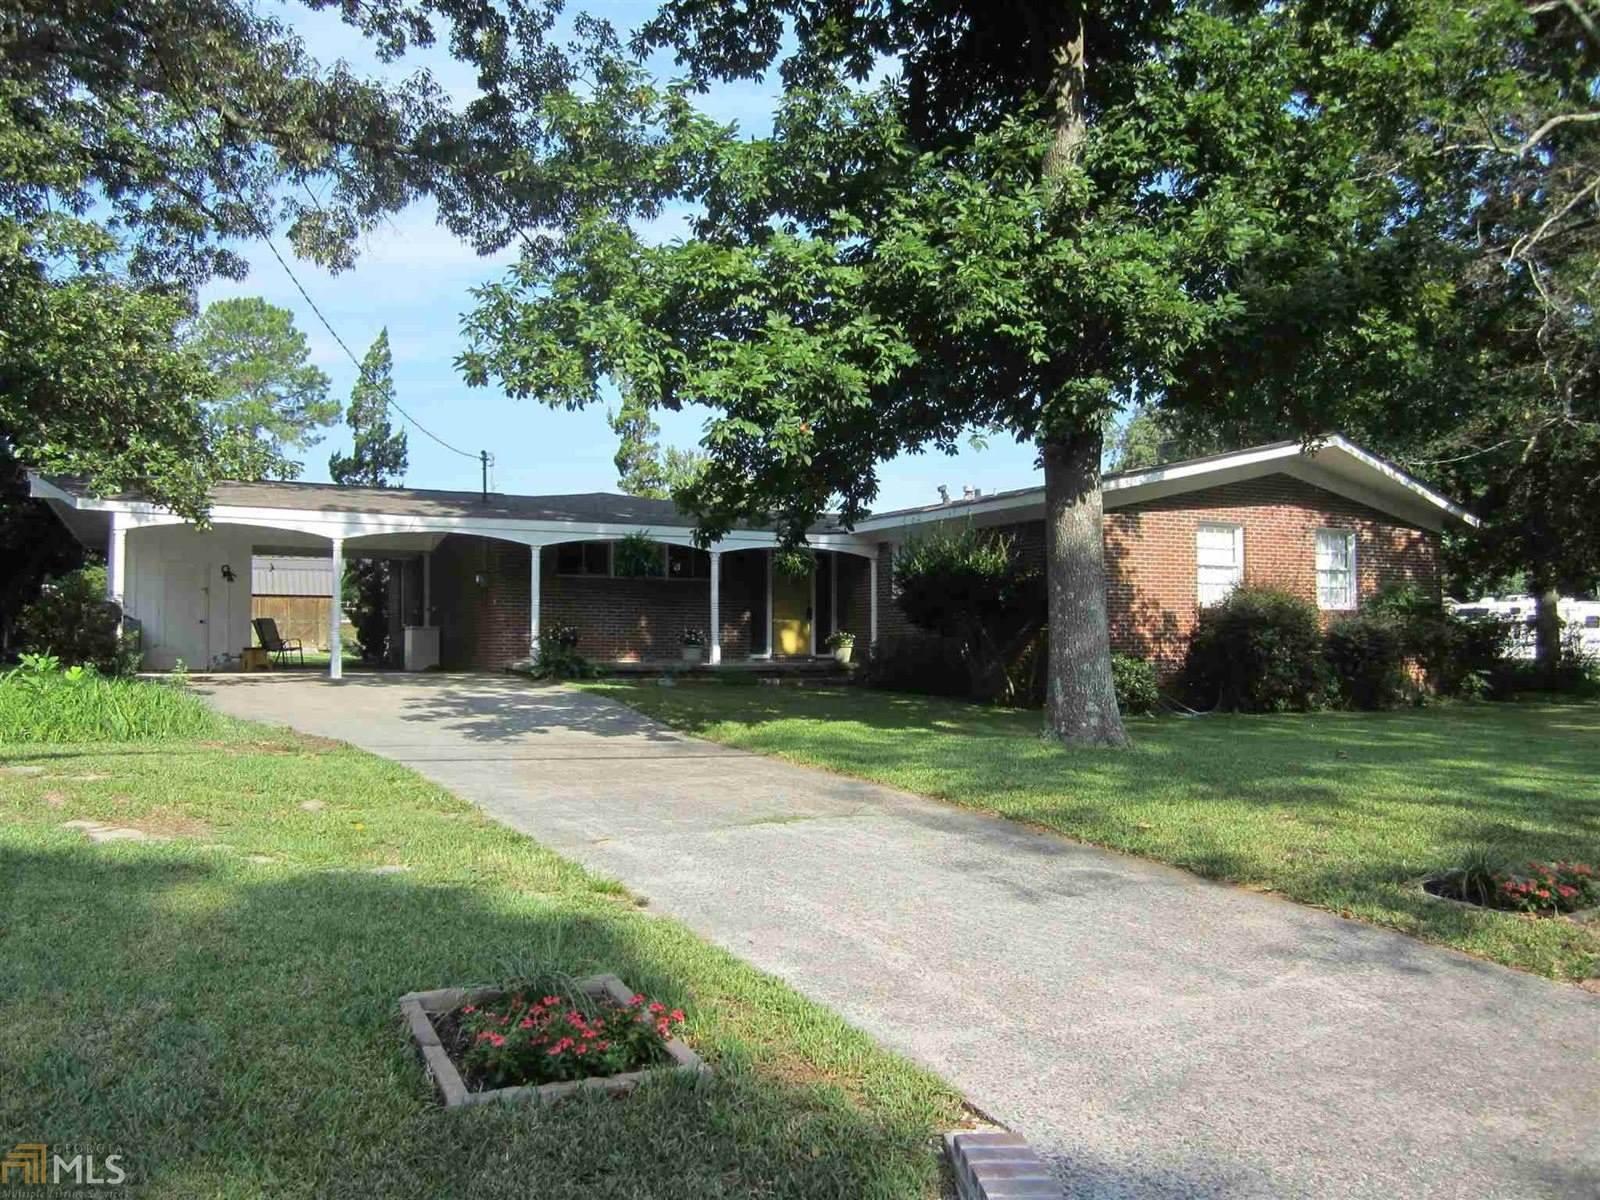 327 Clairmont, Warner Robins, GA 31088